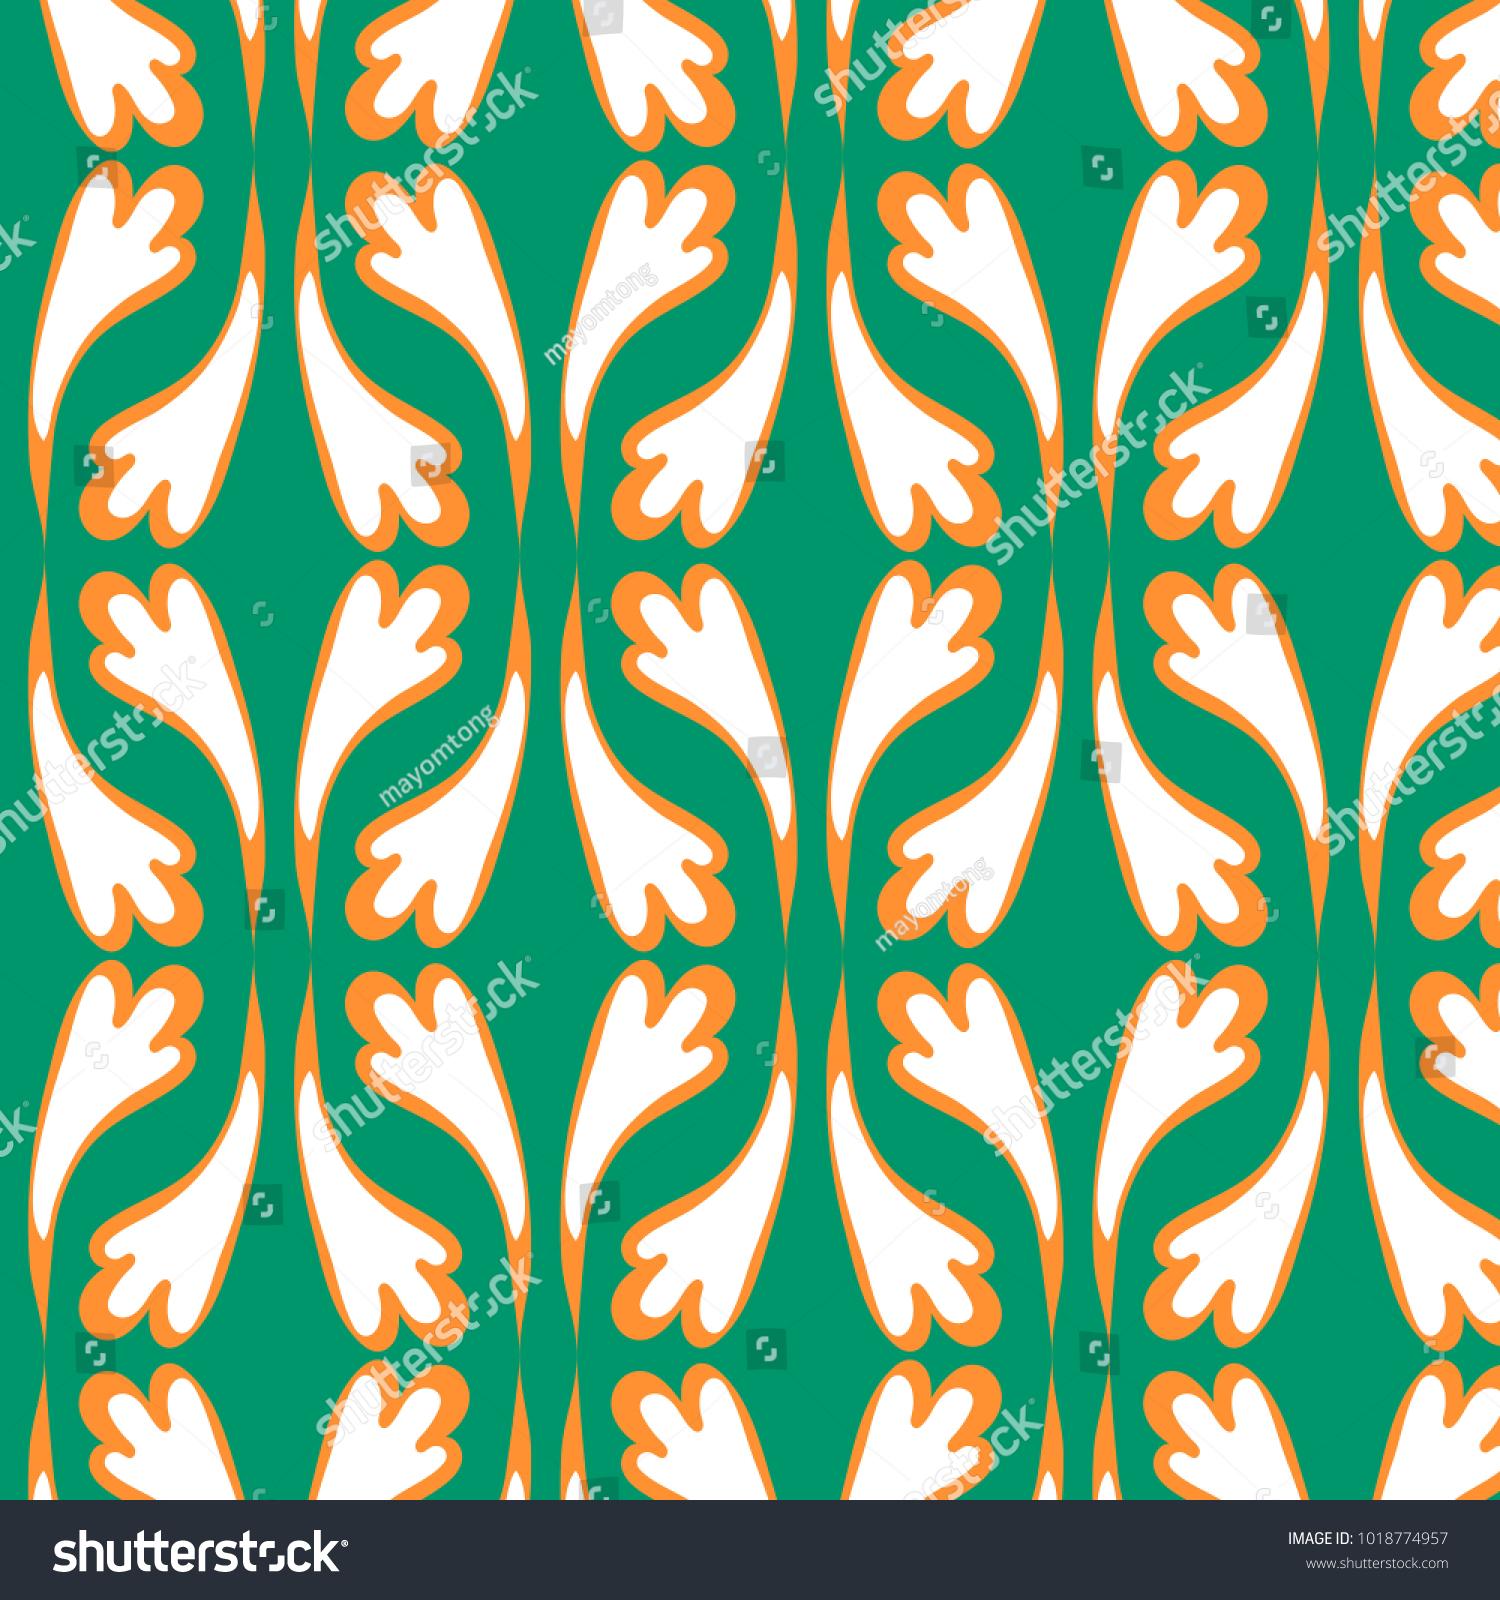 Vector Illustration Of A 70s Wallpaper Patterns